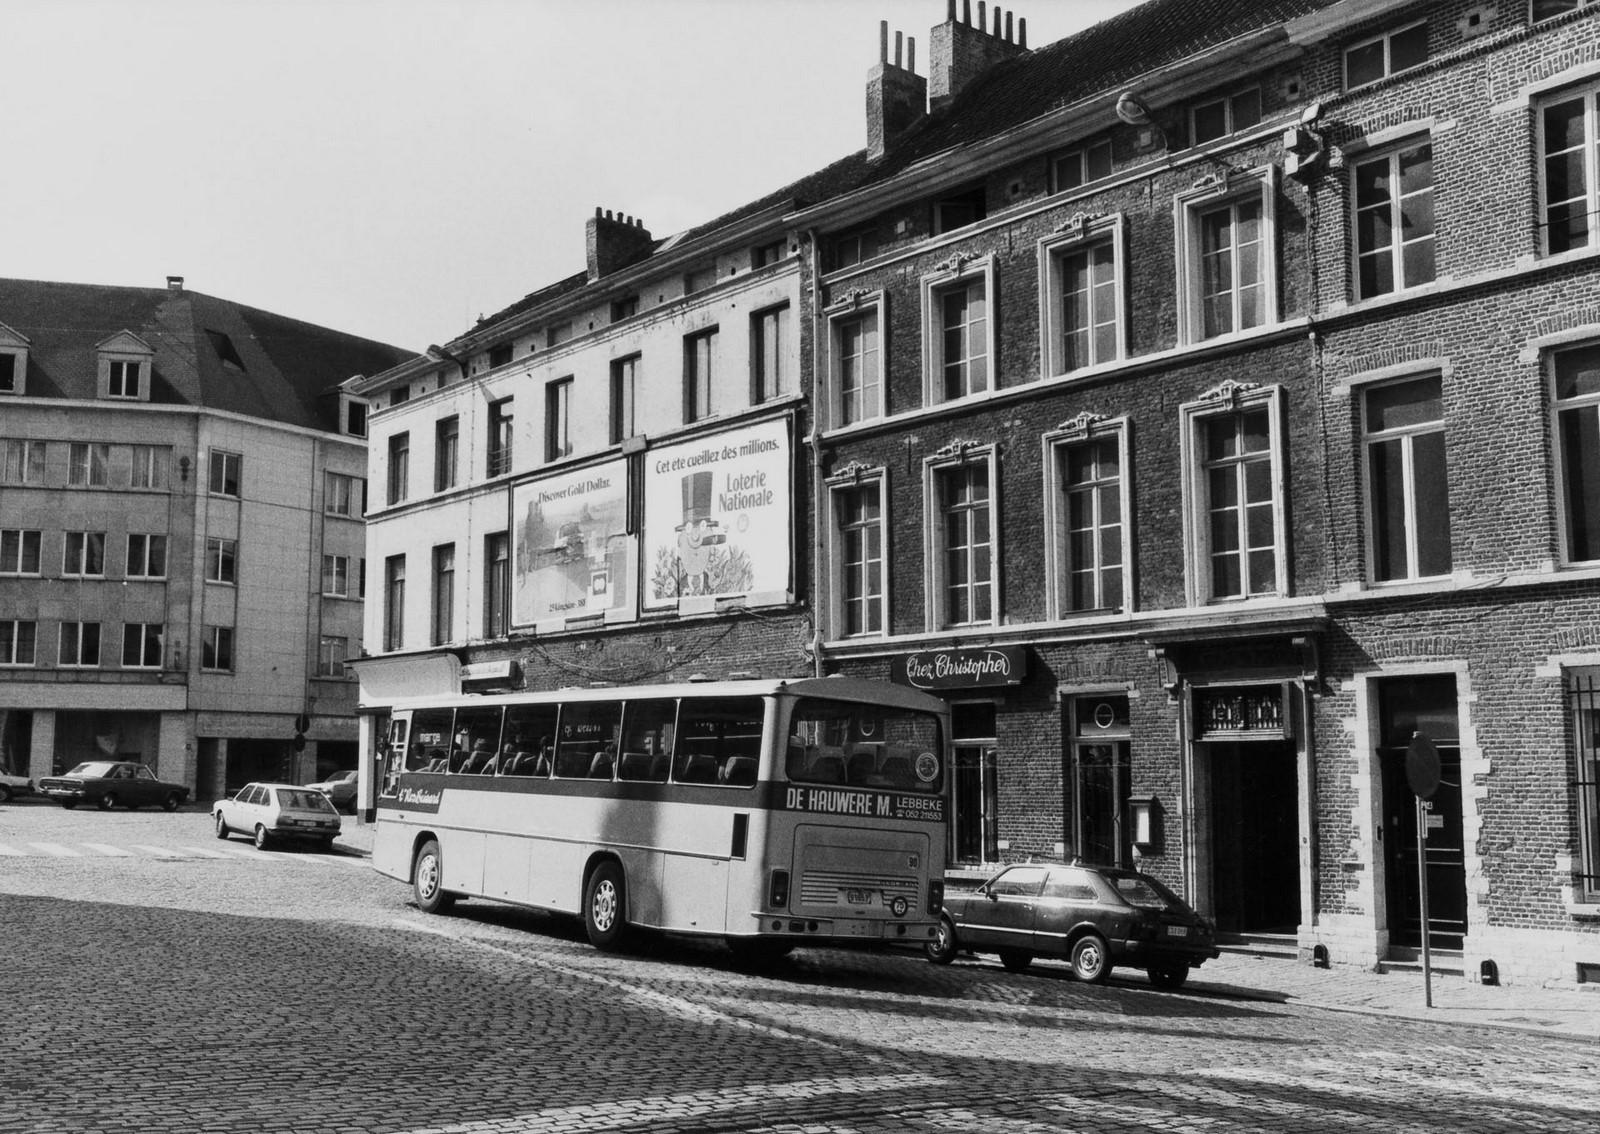 place de la Chapelle 4-5, 6-7, angle rue de la Chapelle., 1980